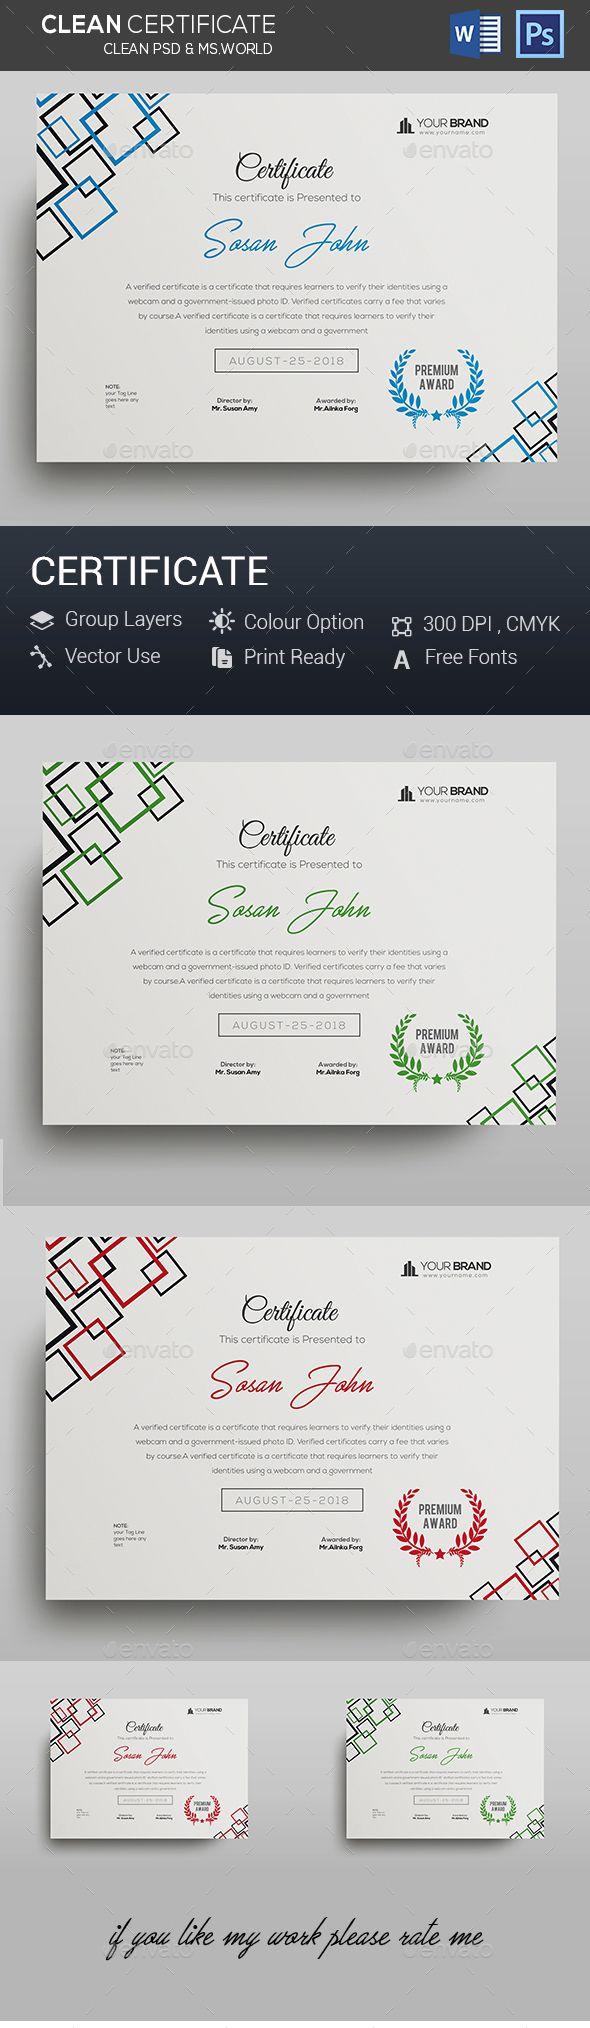 Certificate #certificate design #standard  • Download here → https://graphicriver.net/item/certificate/20281600?ref=pxcr